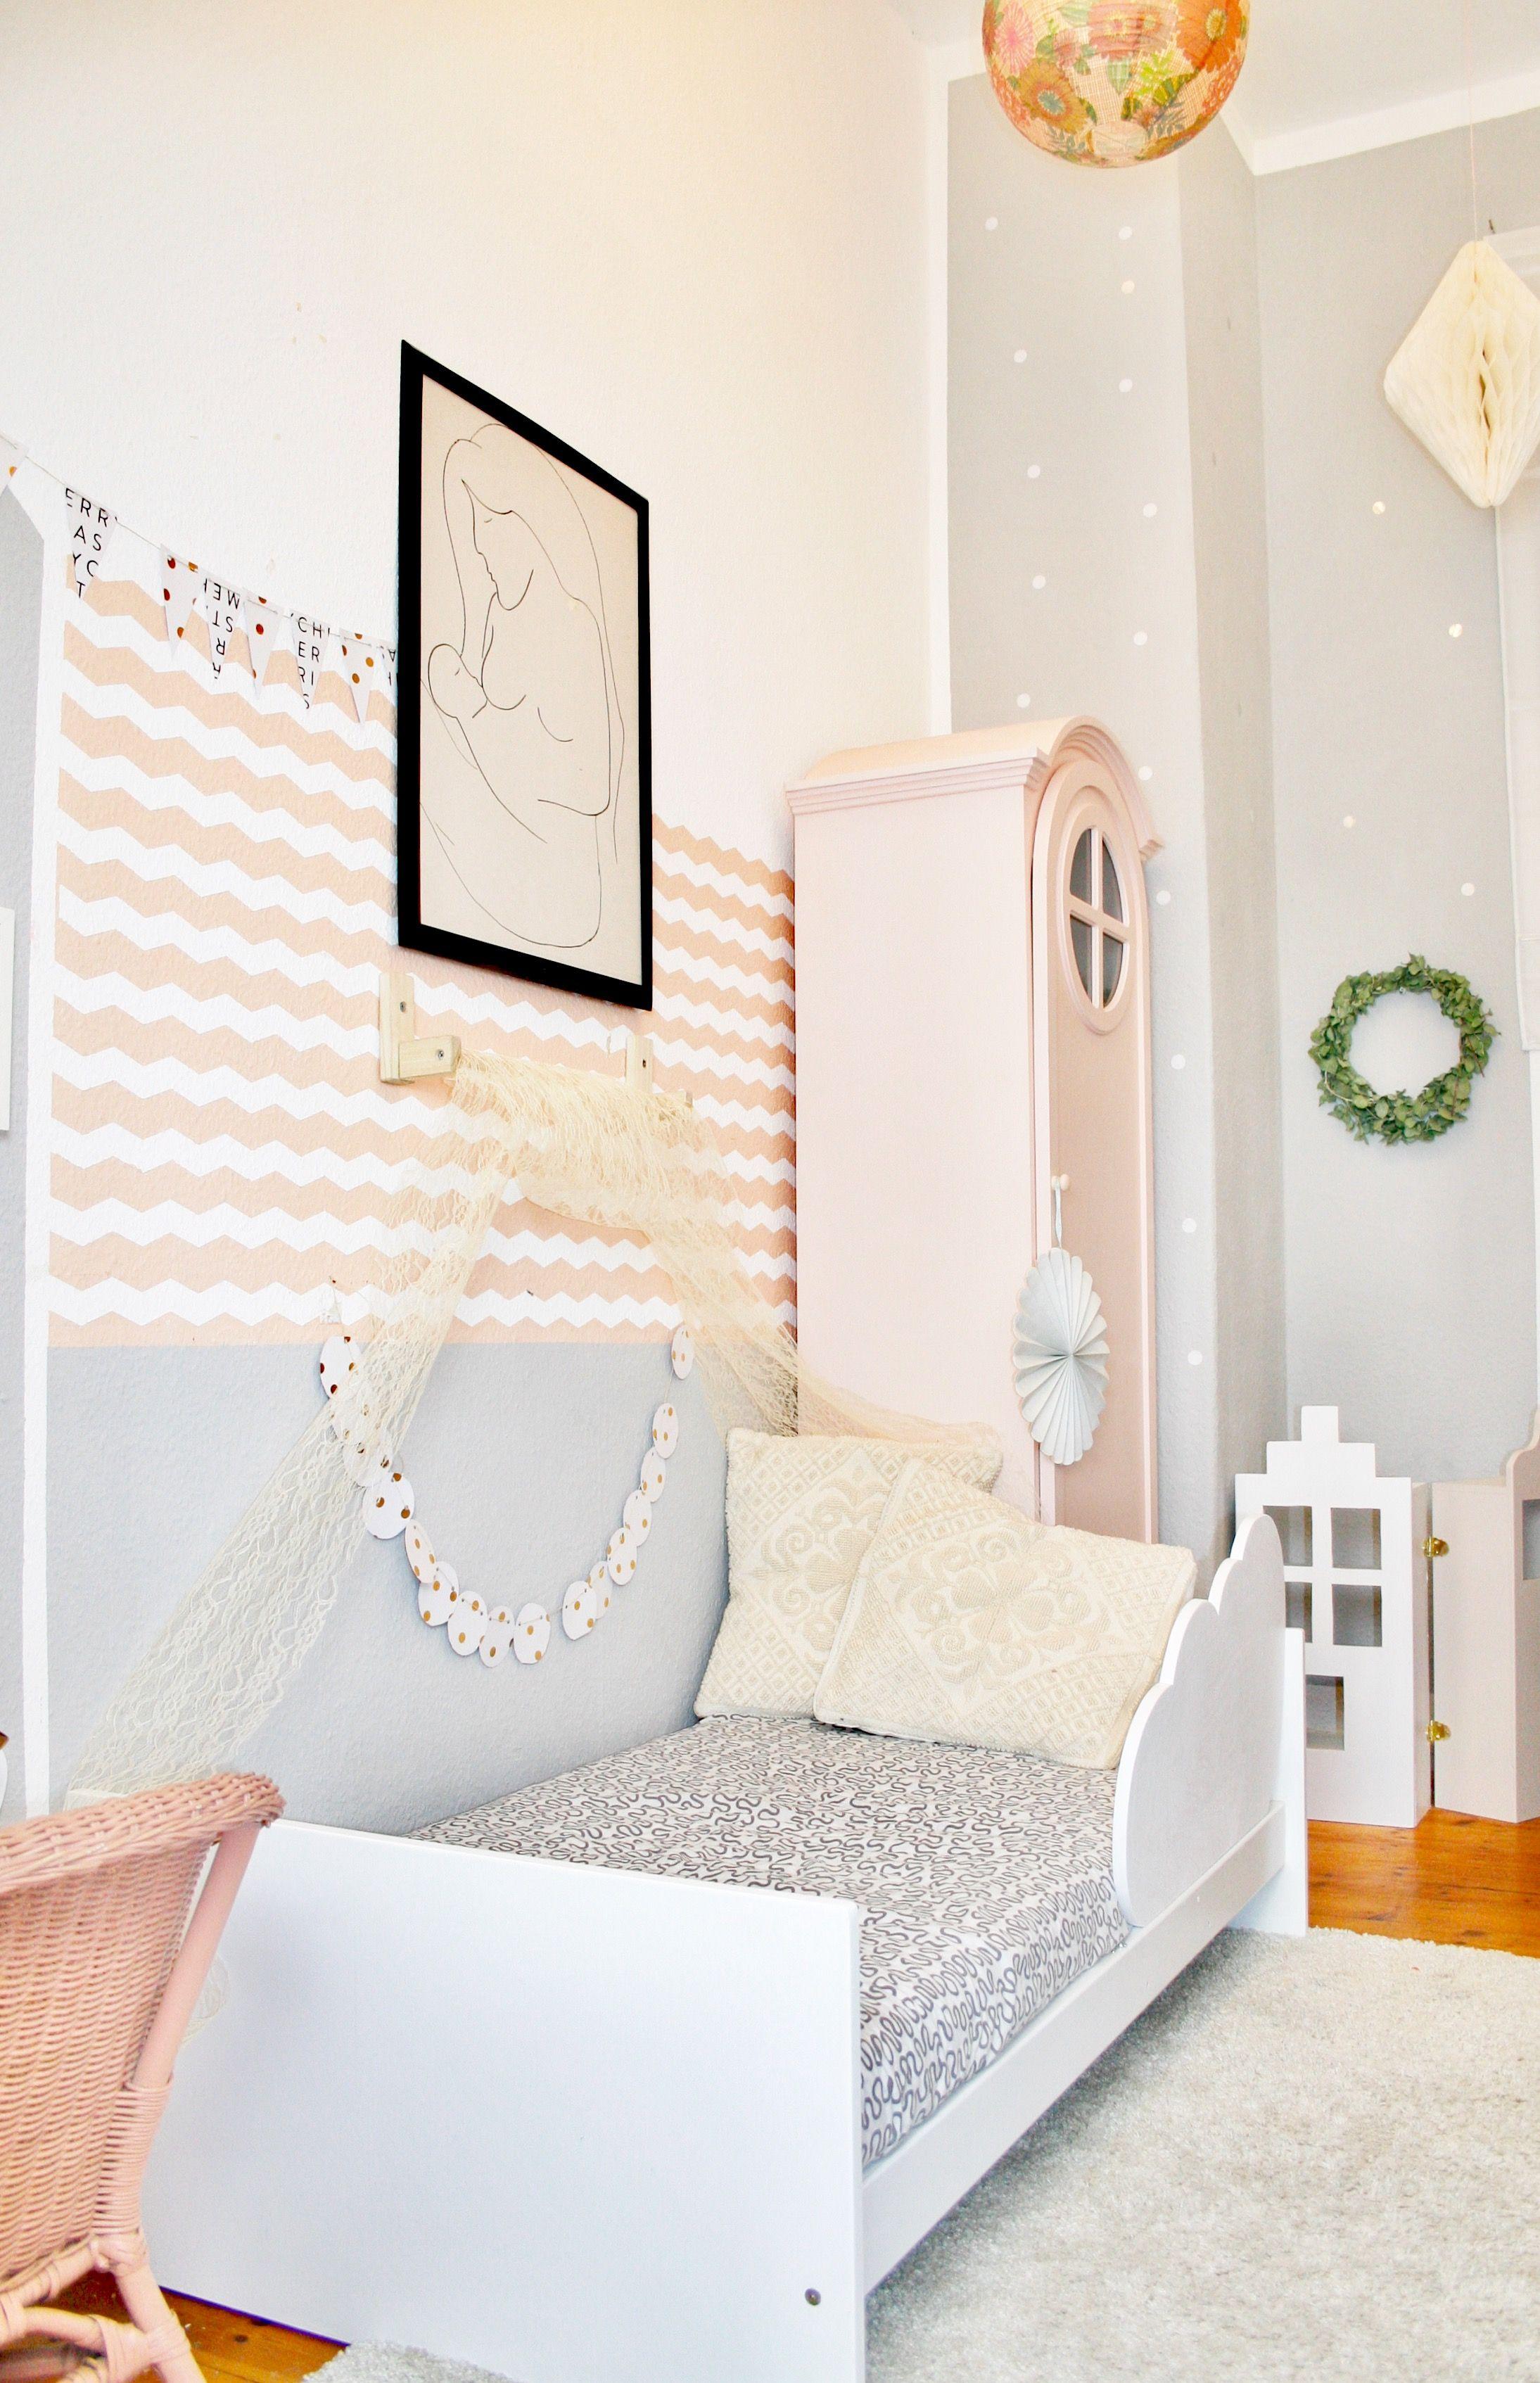 Kinderzimmer Mit Rausfallschutz Bettschutzgitter Wolke Fur Das